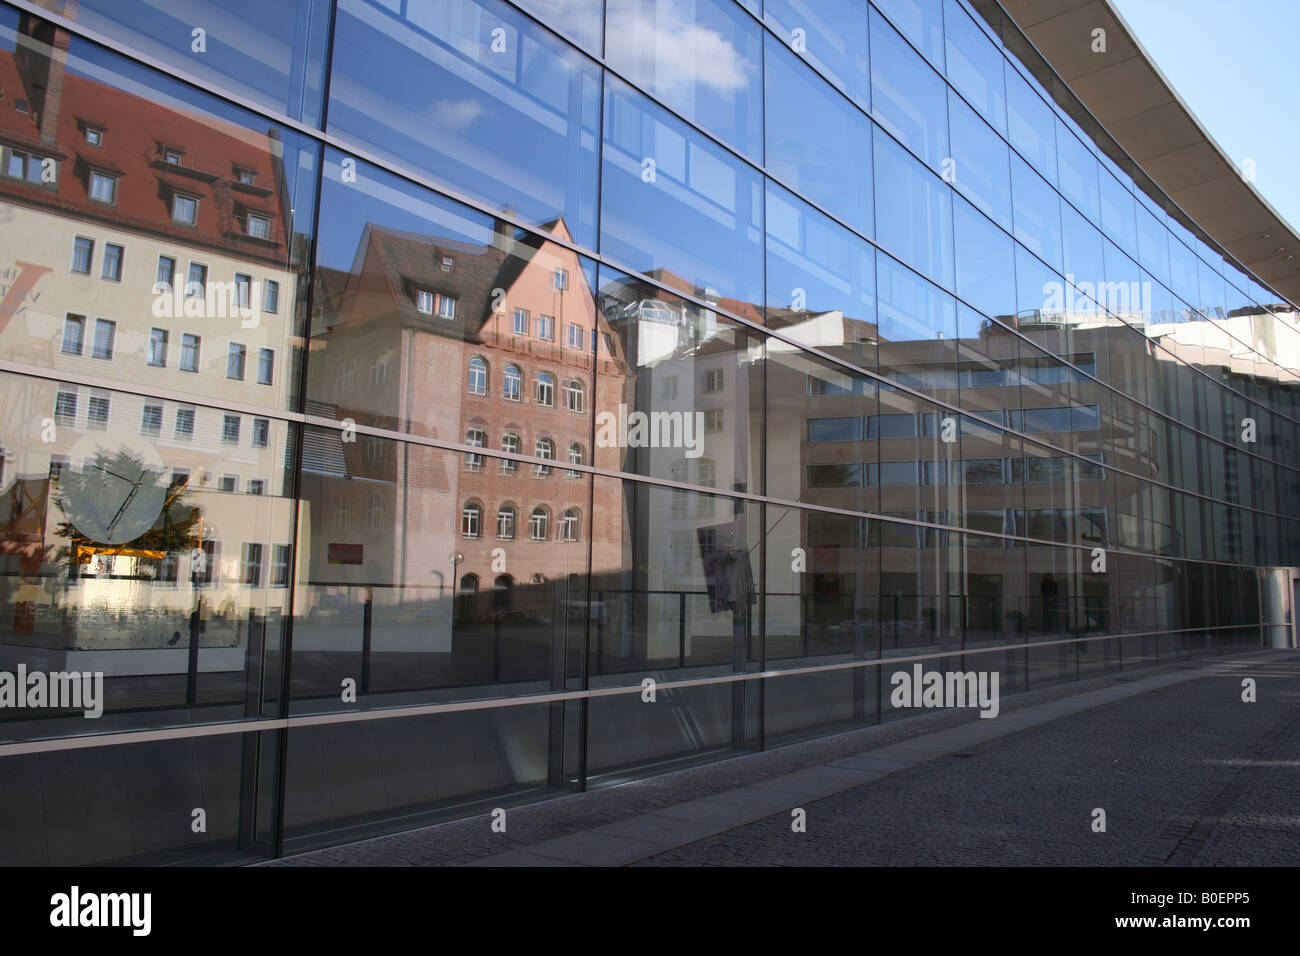 facade of Neues Museum, Nuremberg, Bavaria, Germany, Europe.Photo by Willy Matheisl Stock Photo